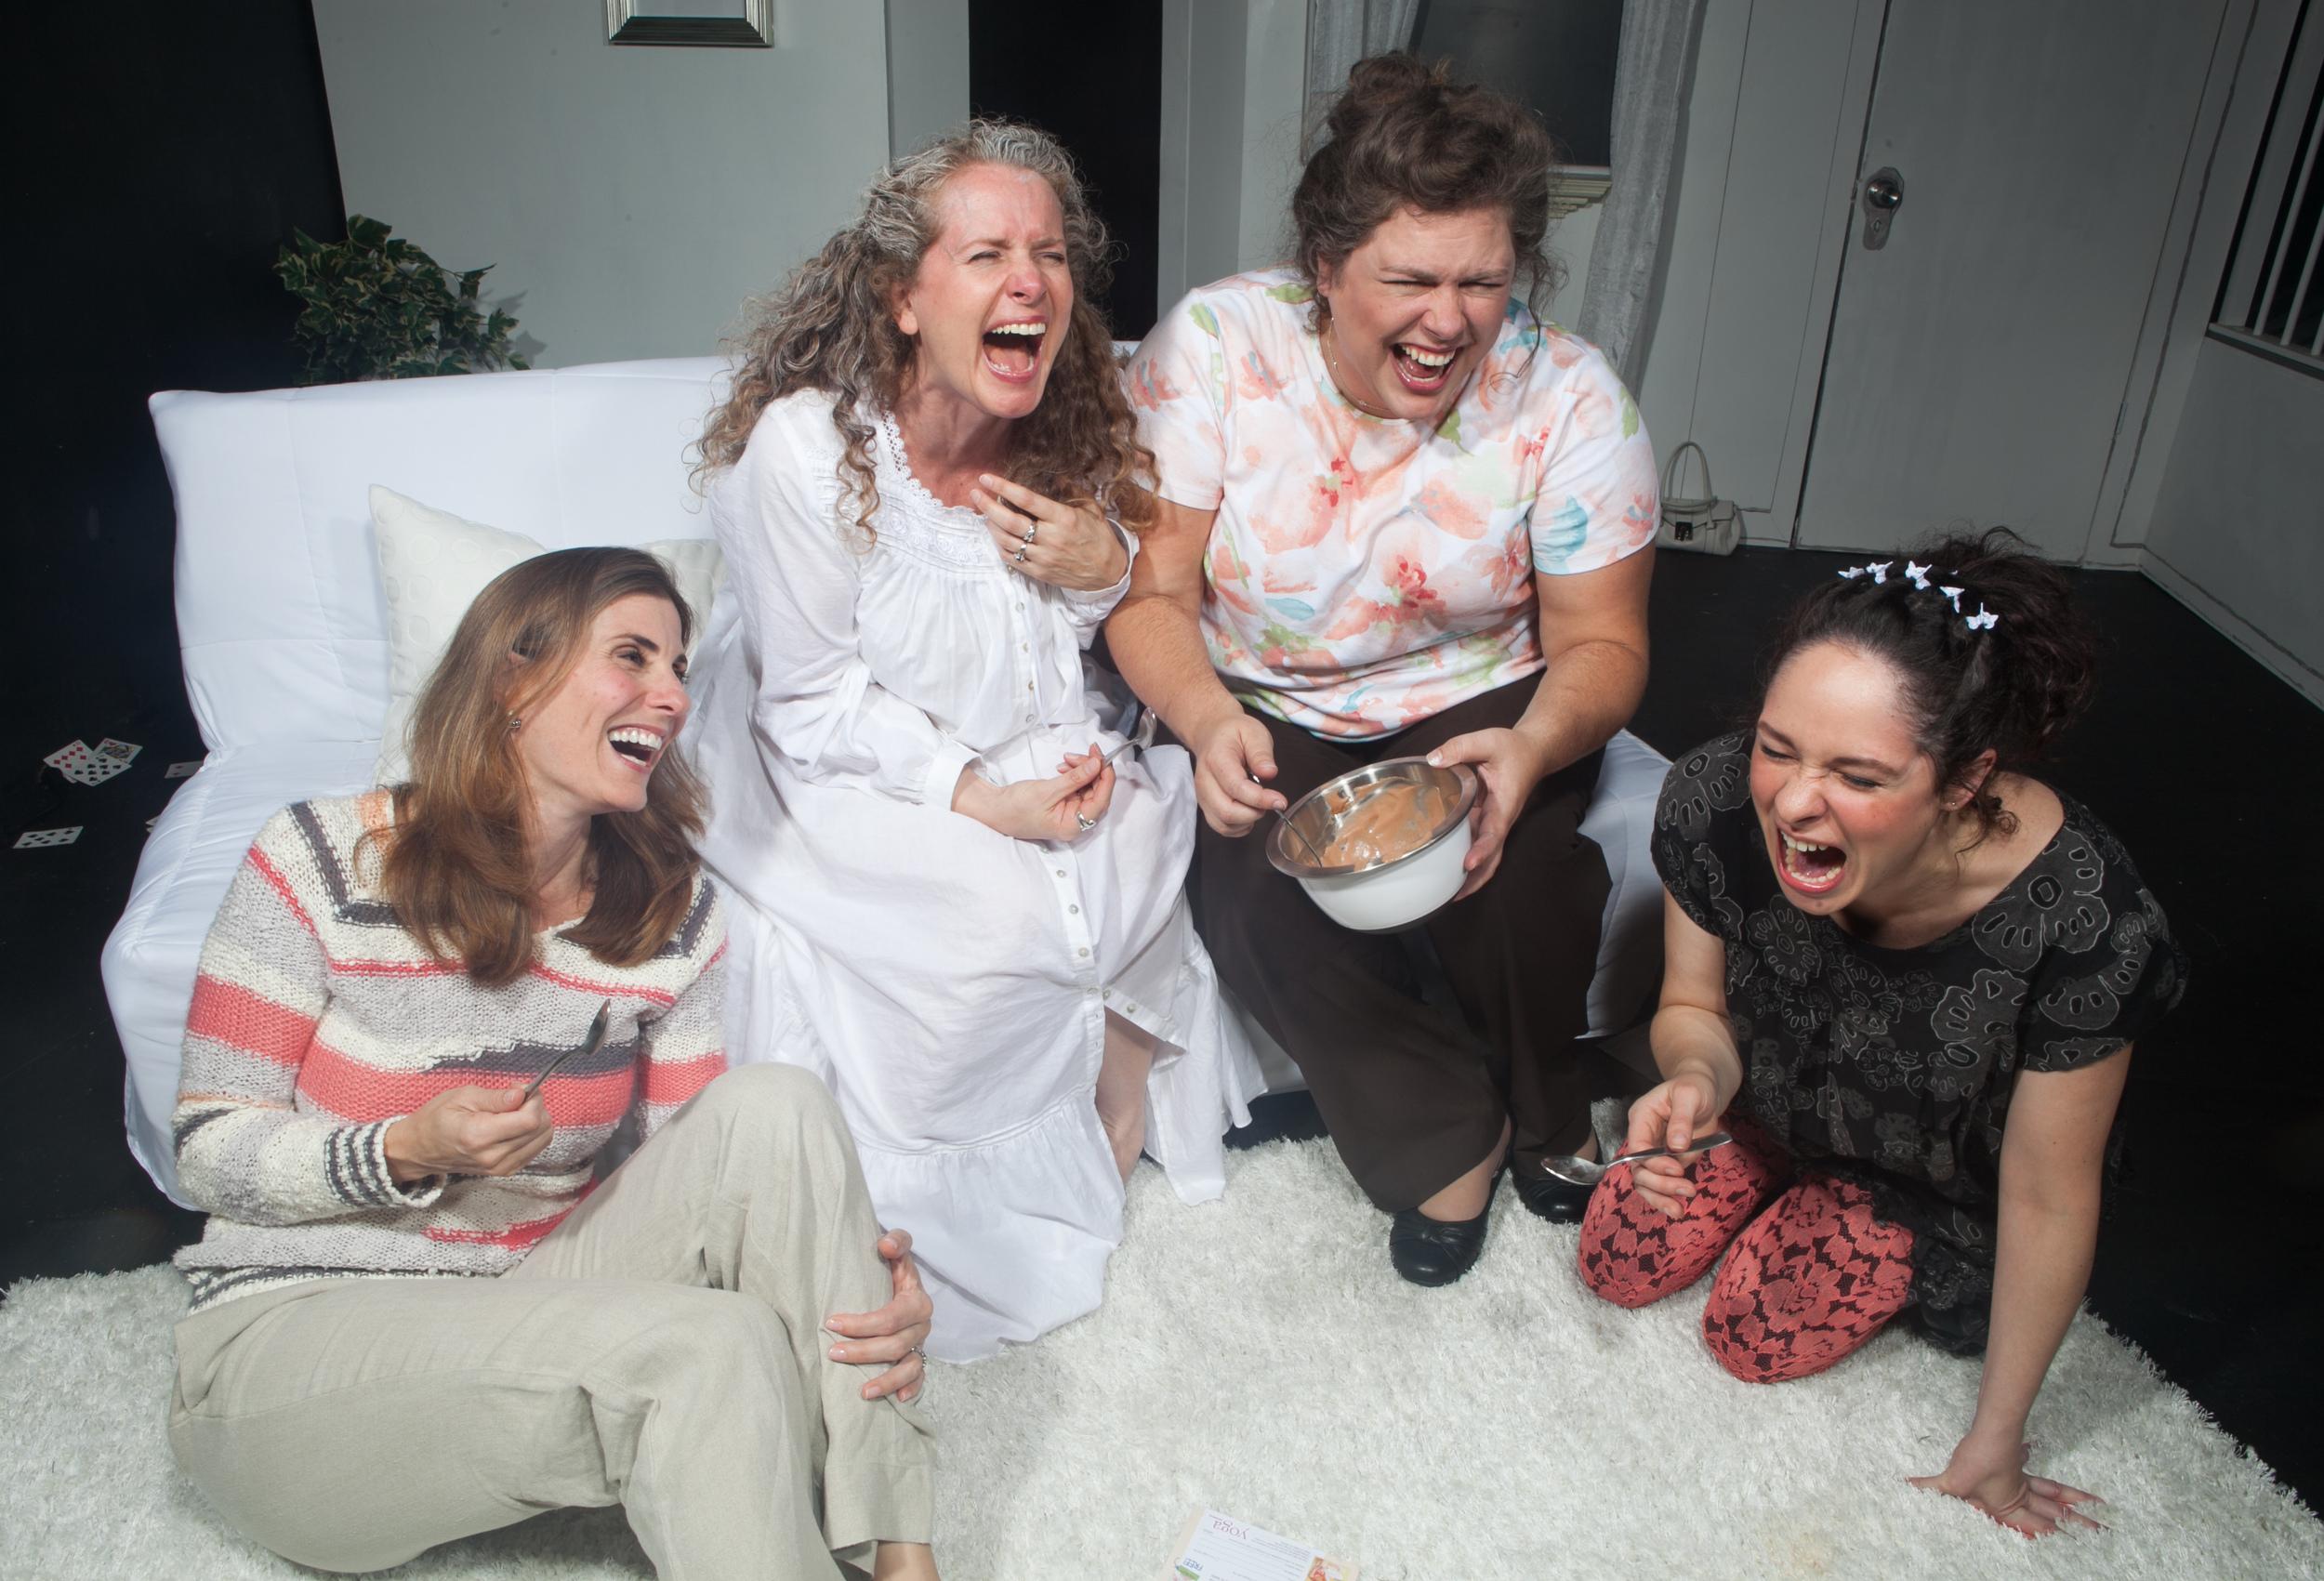 Susan Steinmeyer (Lane), Laura Sturm (Ana), Deborah Hearst (Virginia), and Jaimelyn Gray (Matilde)